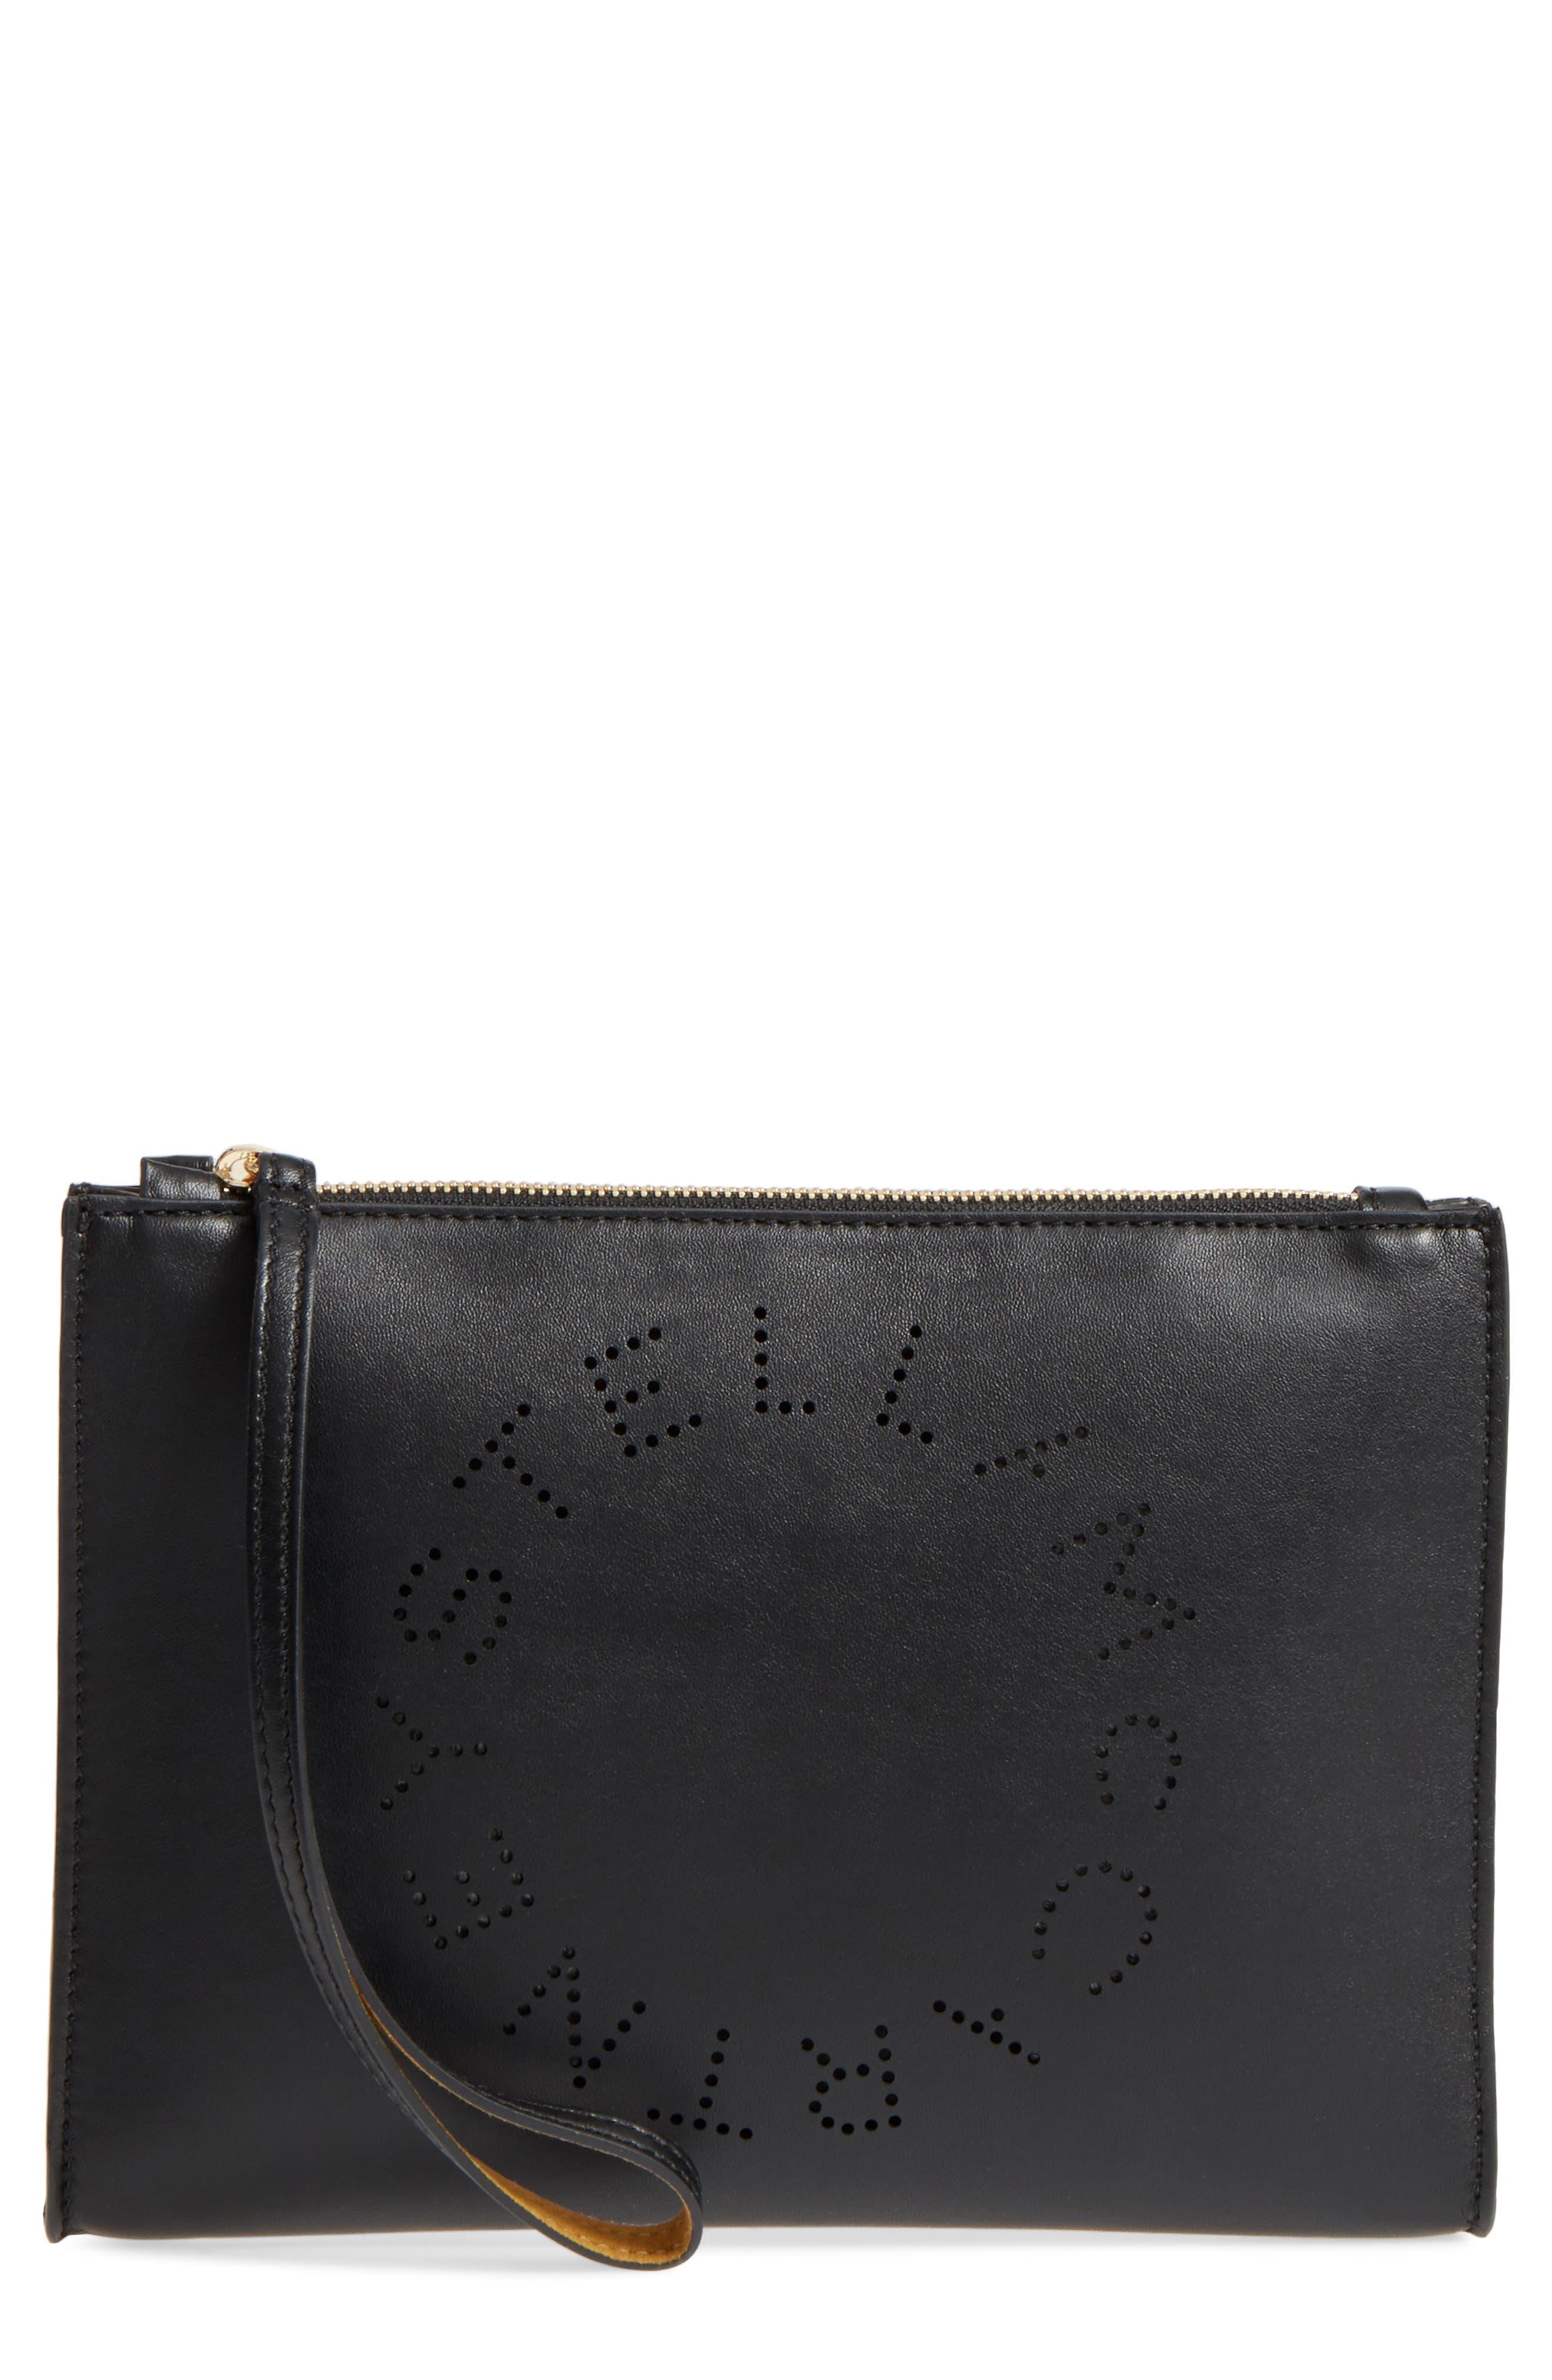 Alter Faux Nappa Leather Wristlet Clutch,                             Main thumbnail 1, color,                             BLACK